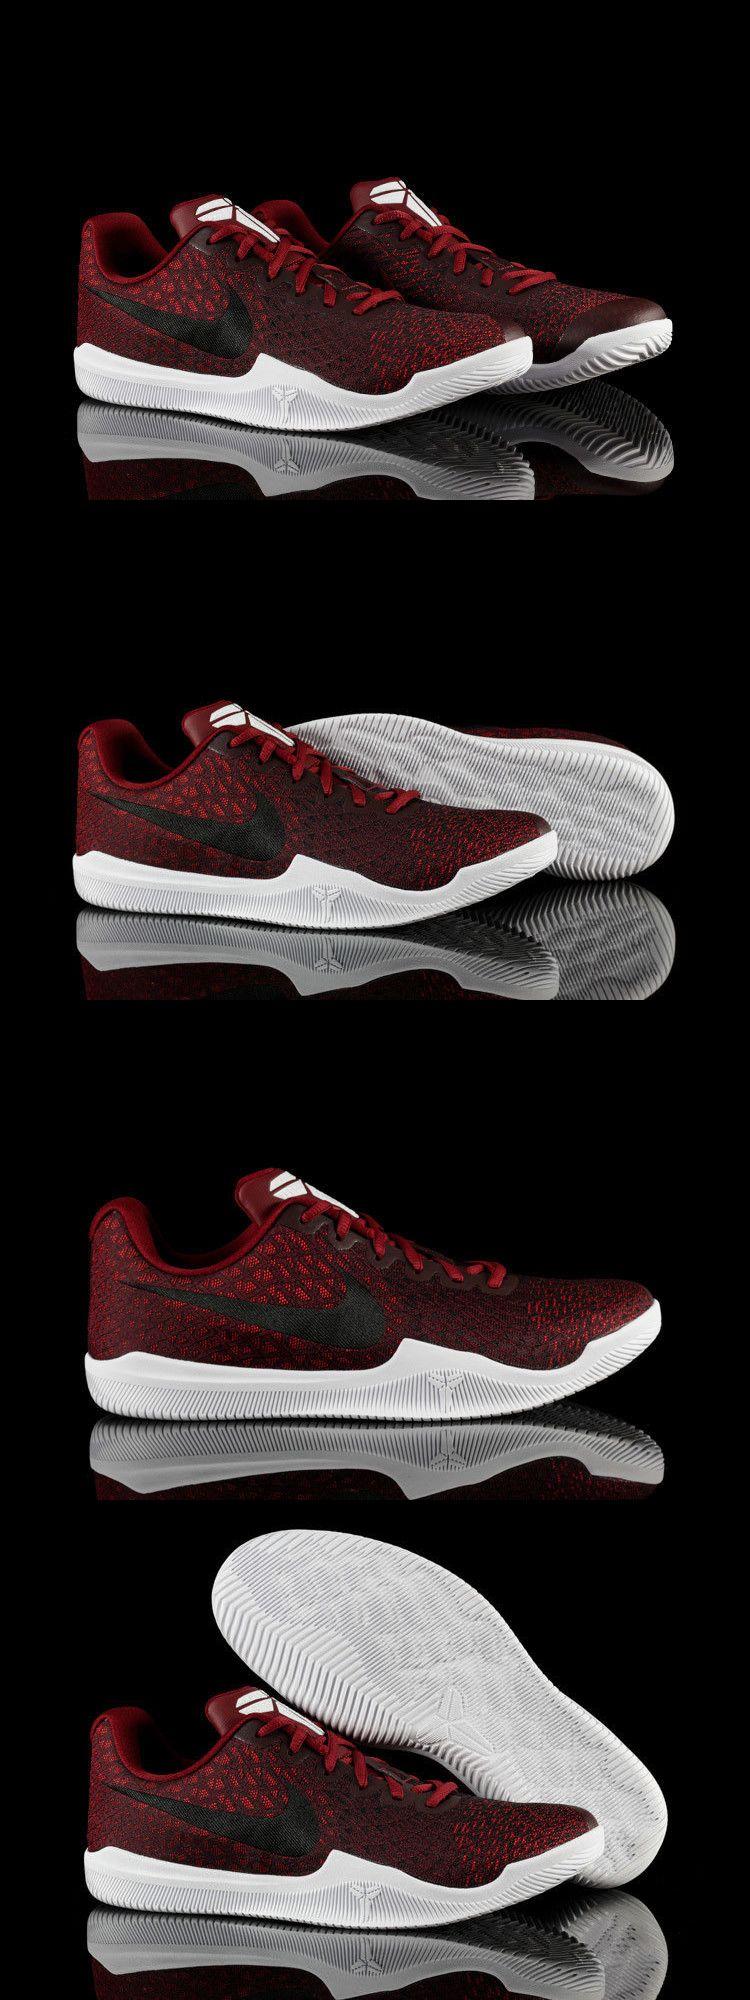 49ec42e266d8 Mens Shoes 93427  Nike Kobe Mamba Instinct Sneakers New